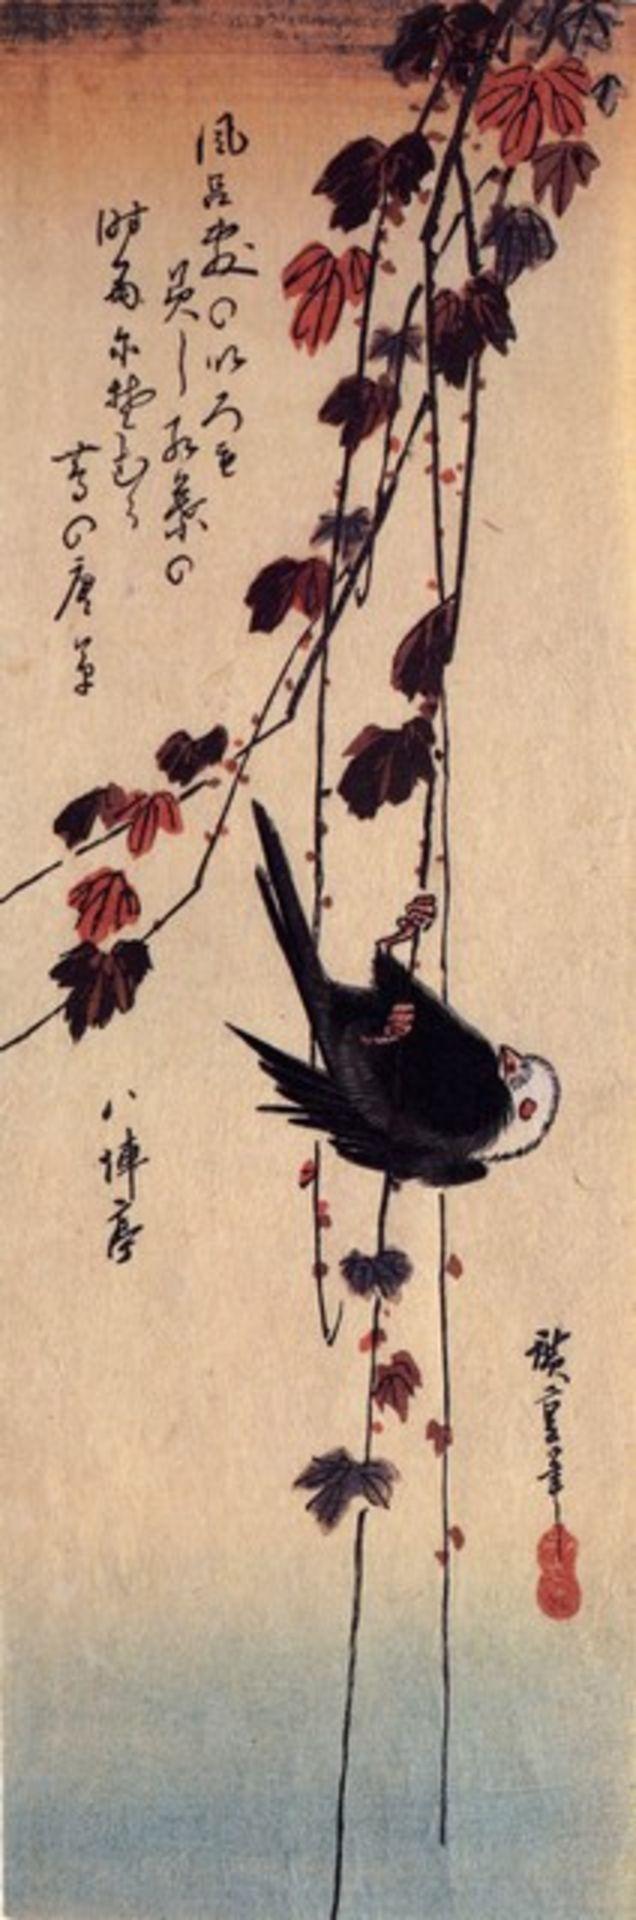 Hiroshige A Small Black Bird Hanging on Ivy